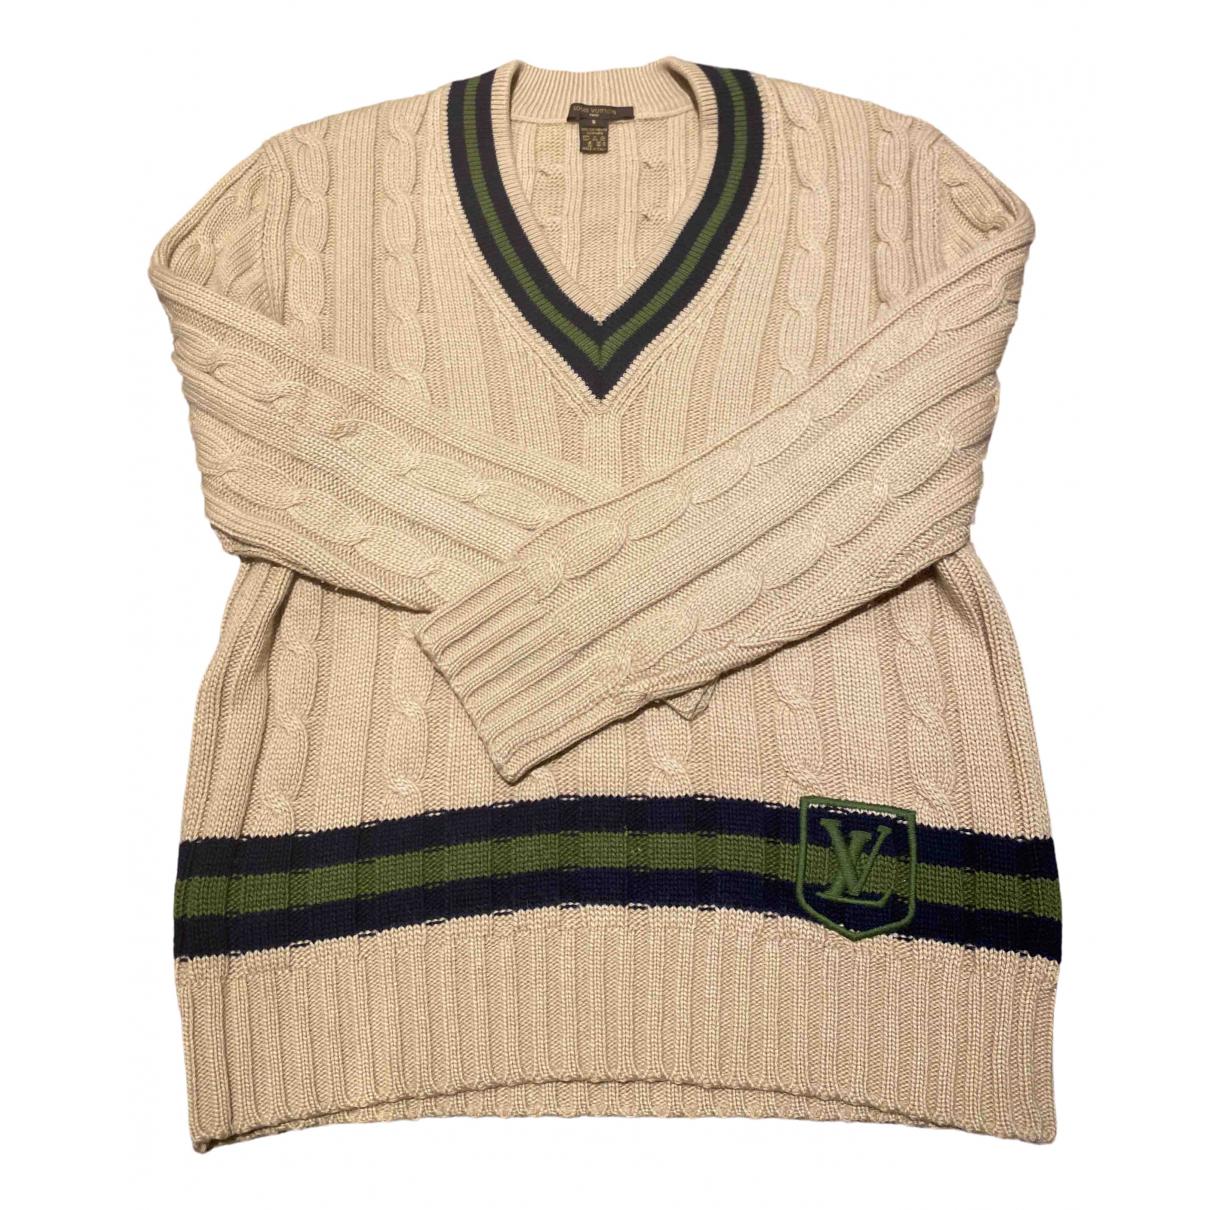 Louis Vuitton N Beige Cashmere Knitwear & Sweatshirts for Men S International